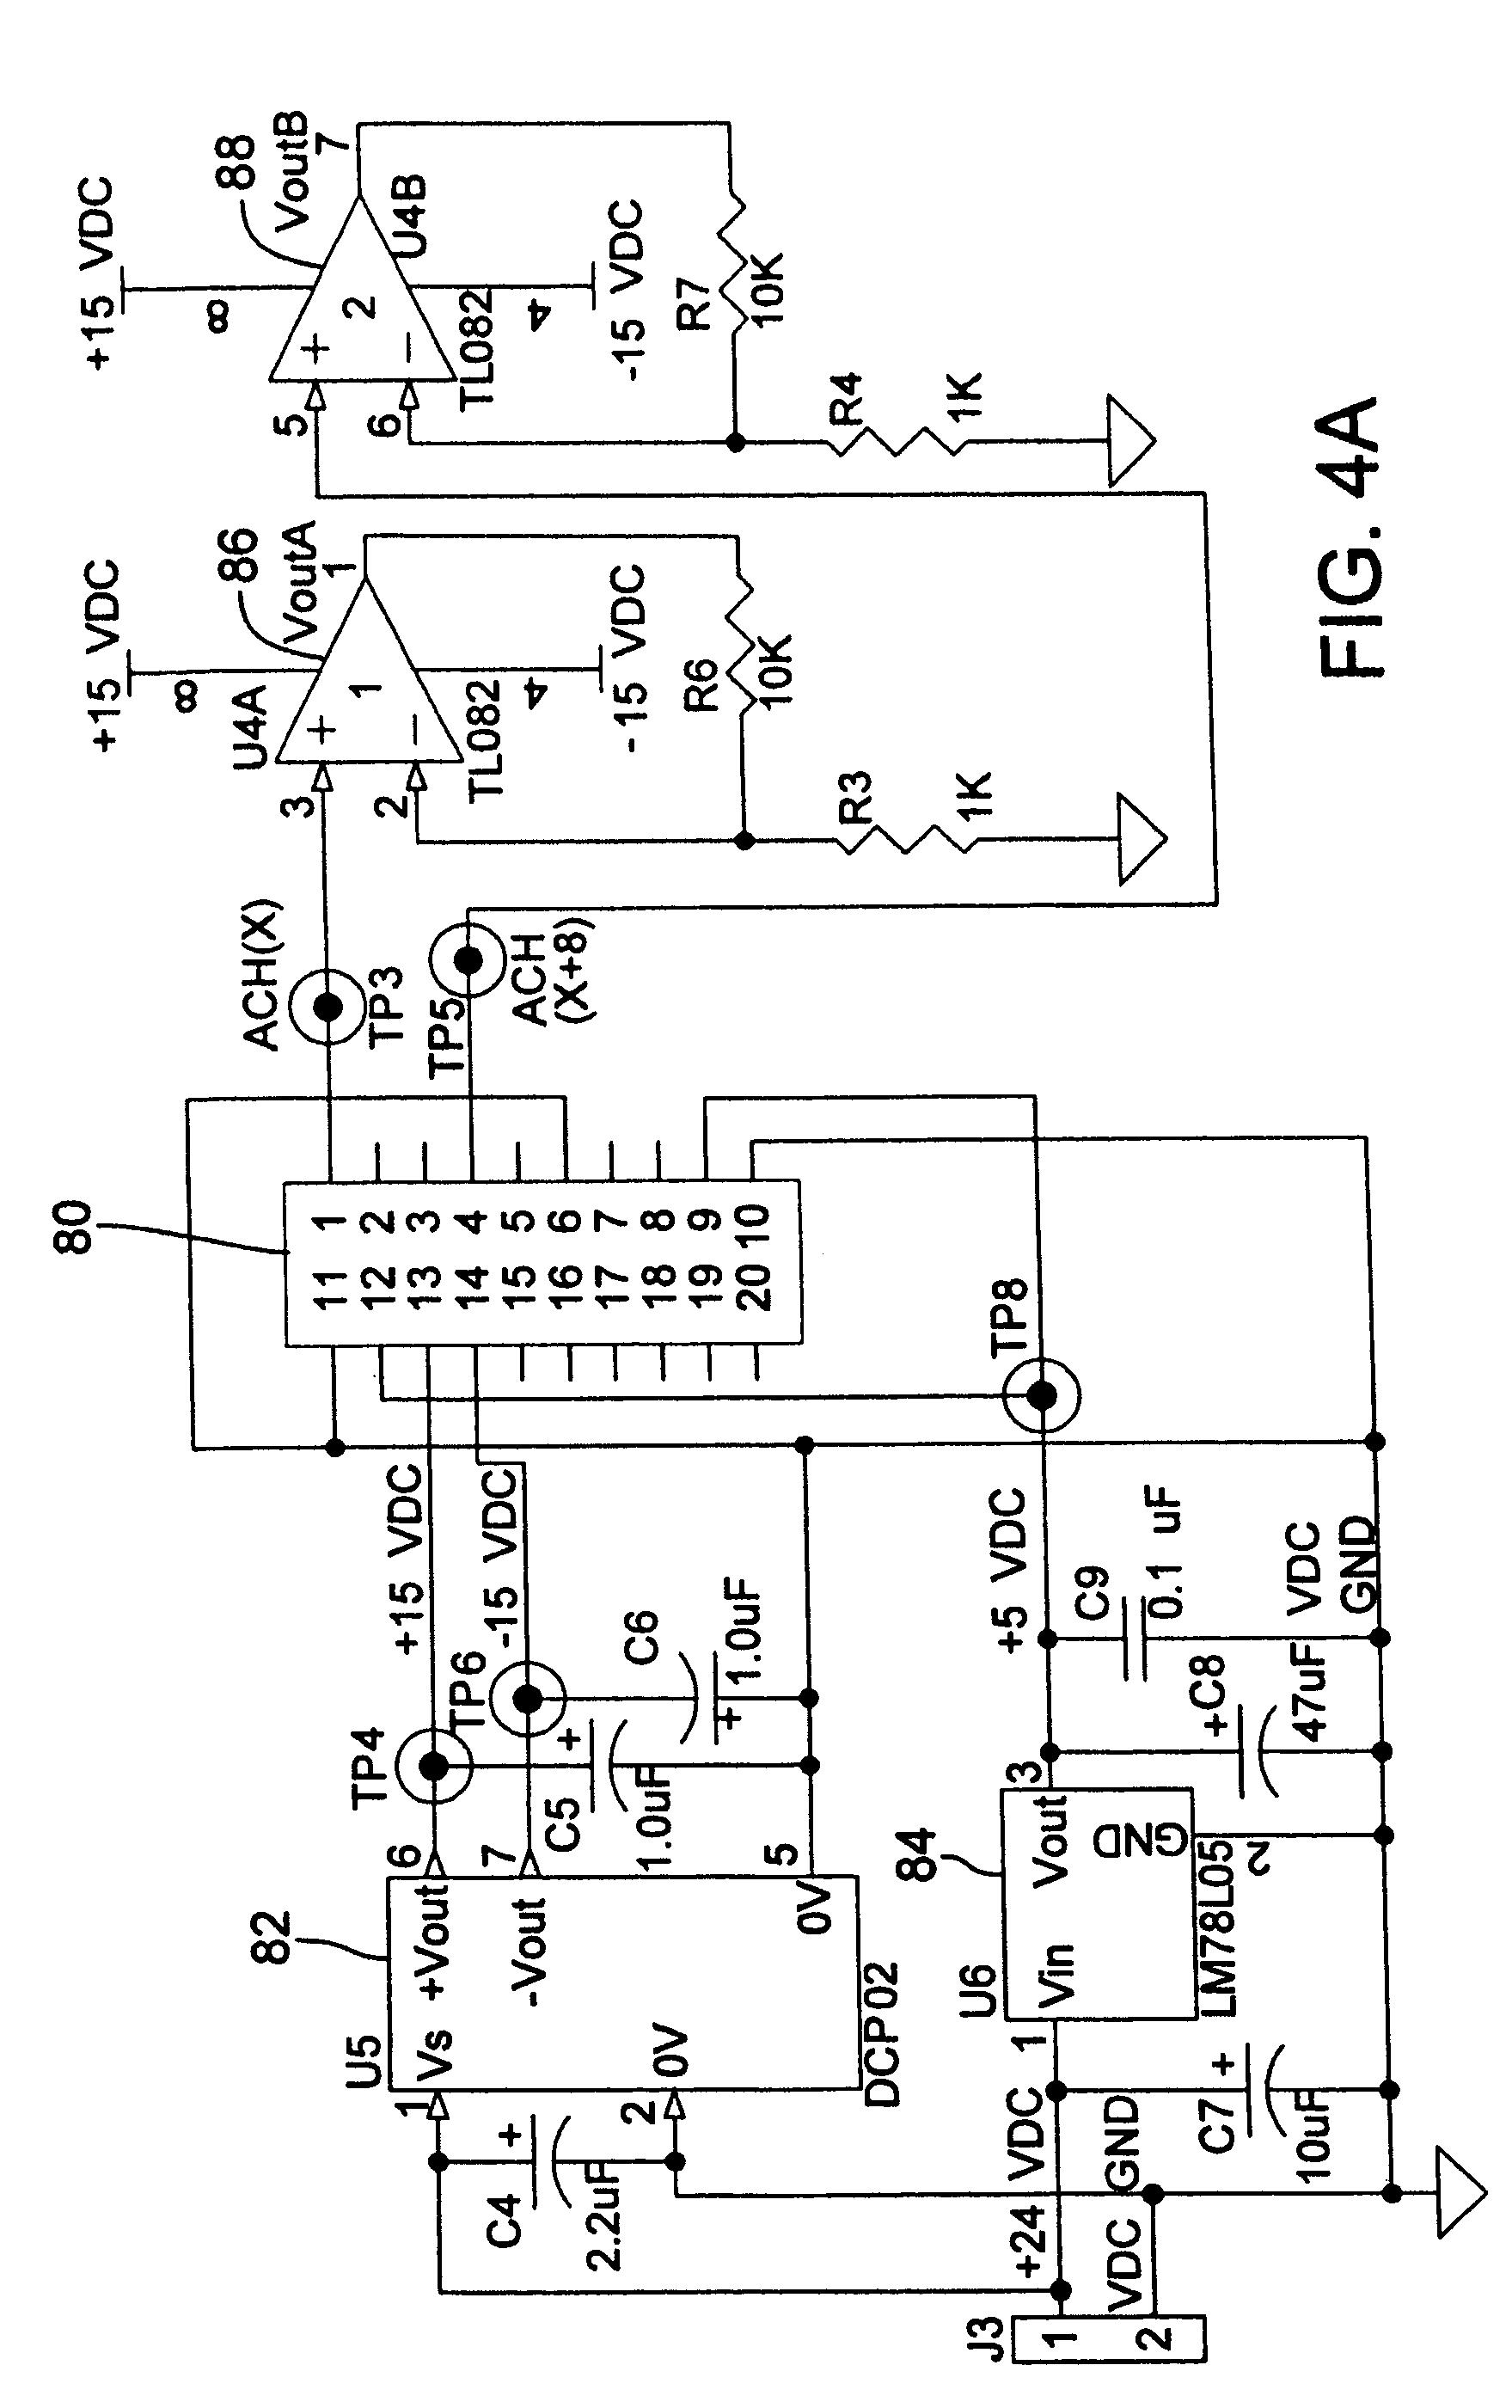 Harley Davidson Turn Signal Module Wiring Diagram Another Blog Flasher 2006 Street Glide